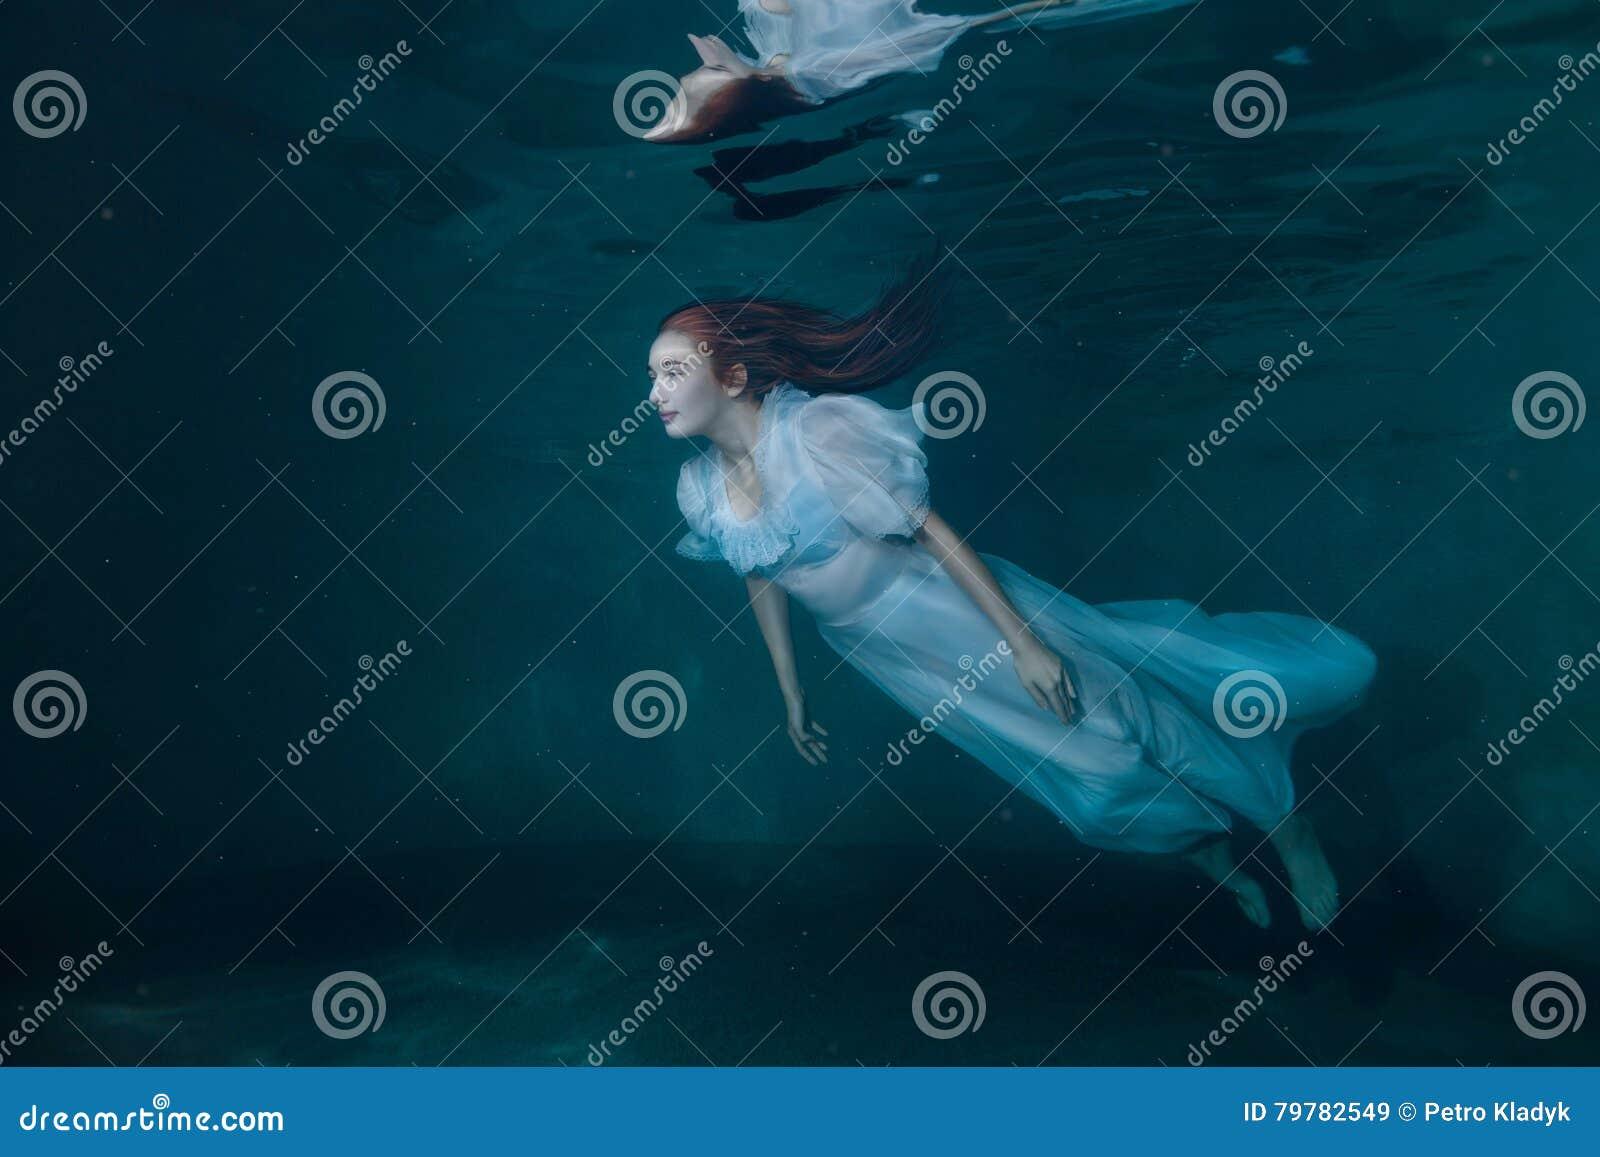 Feevrouw in witte kleding onderwater